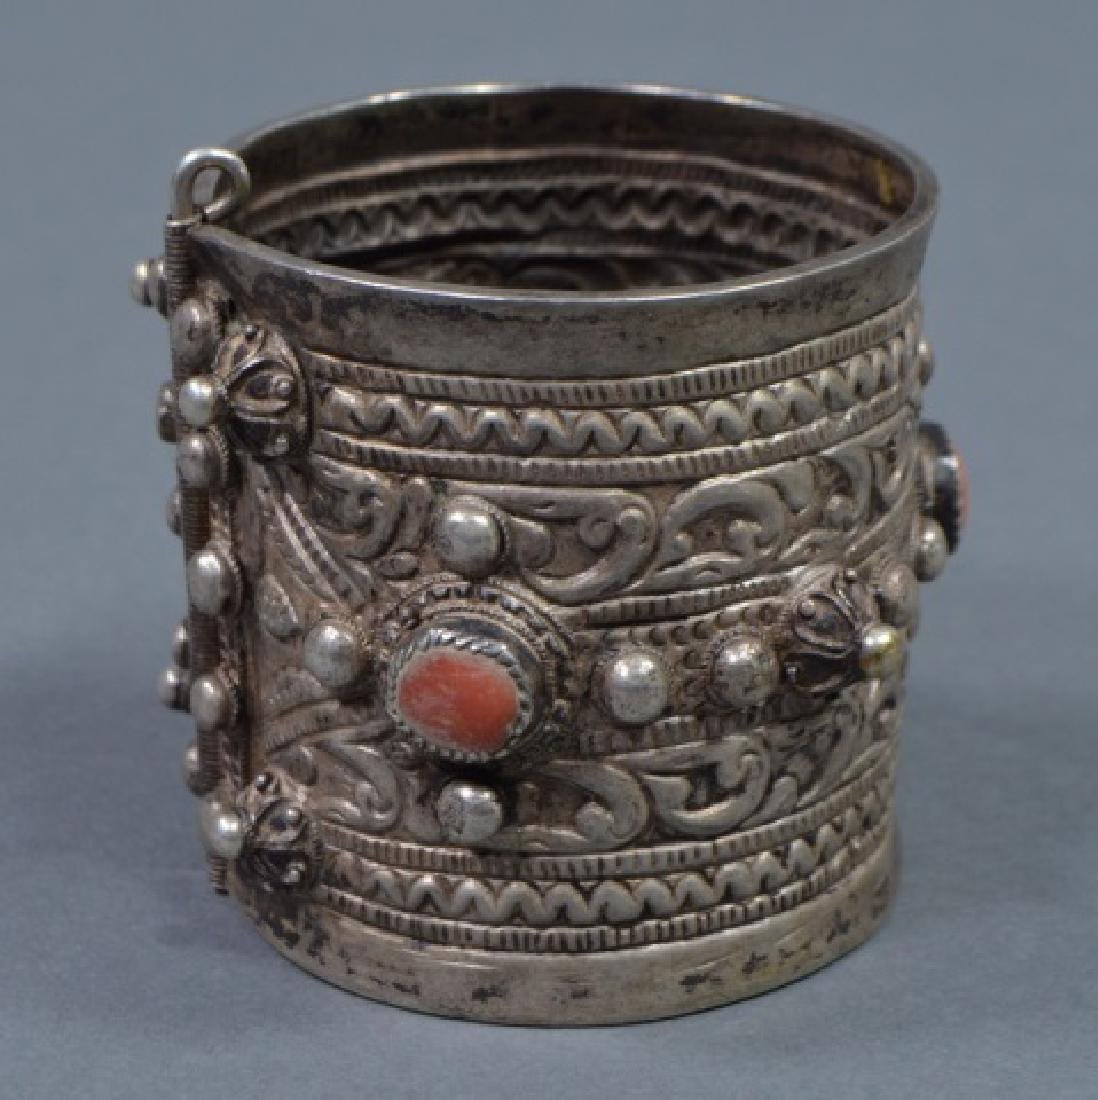 North African Silver Cuff Bracelet - 3